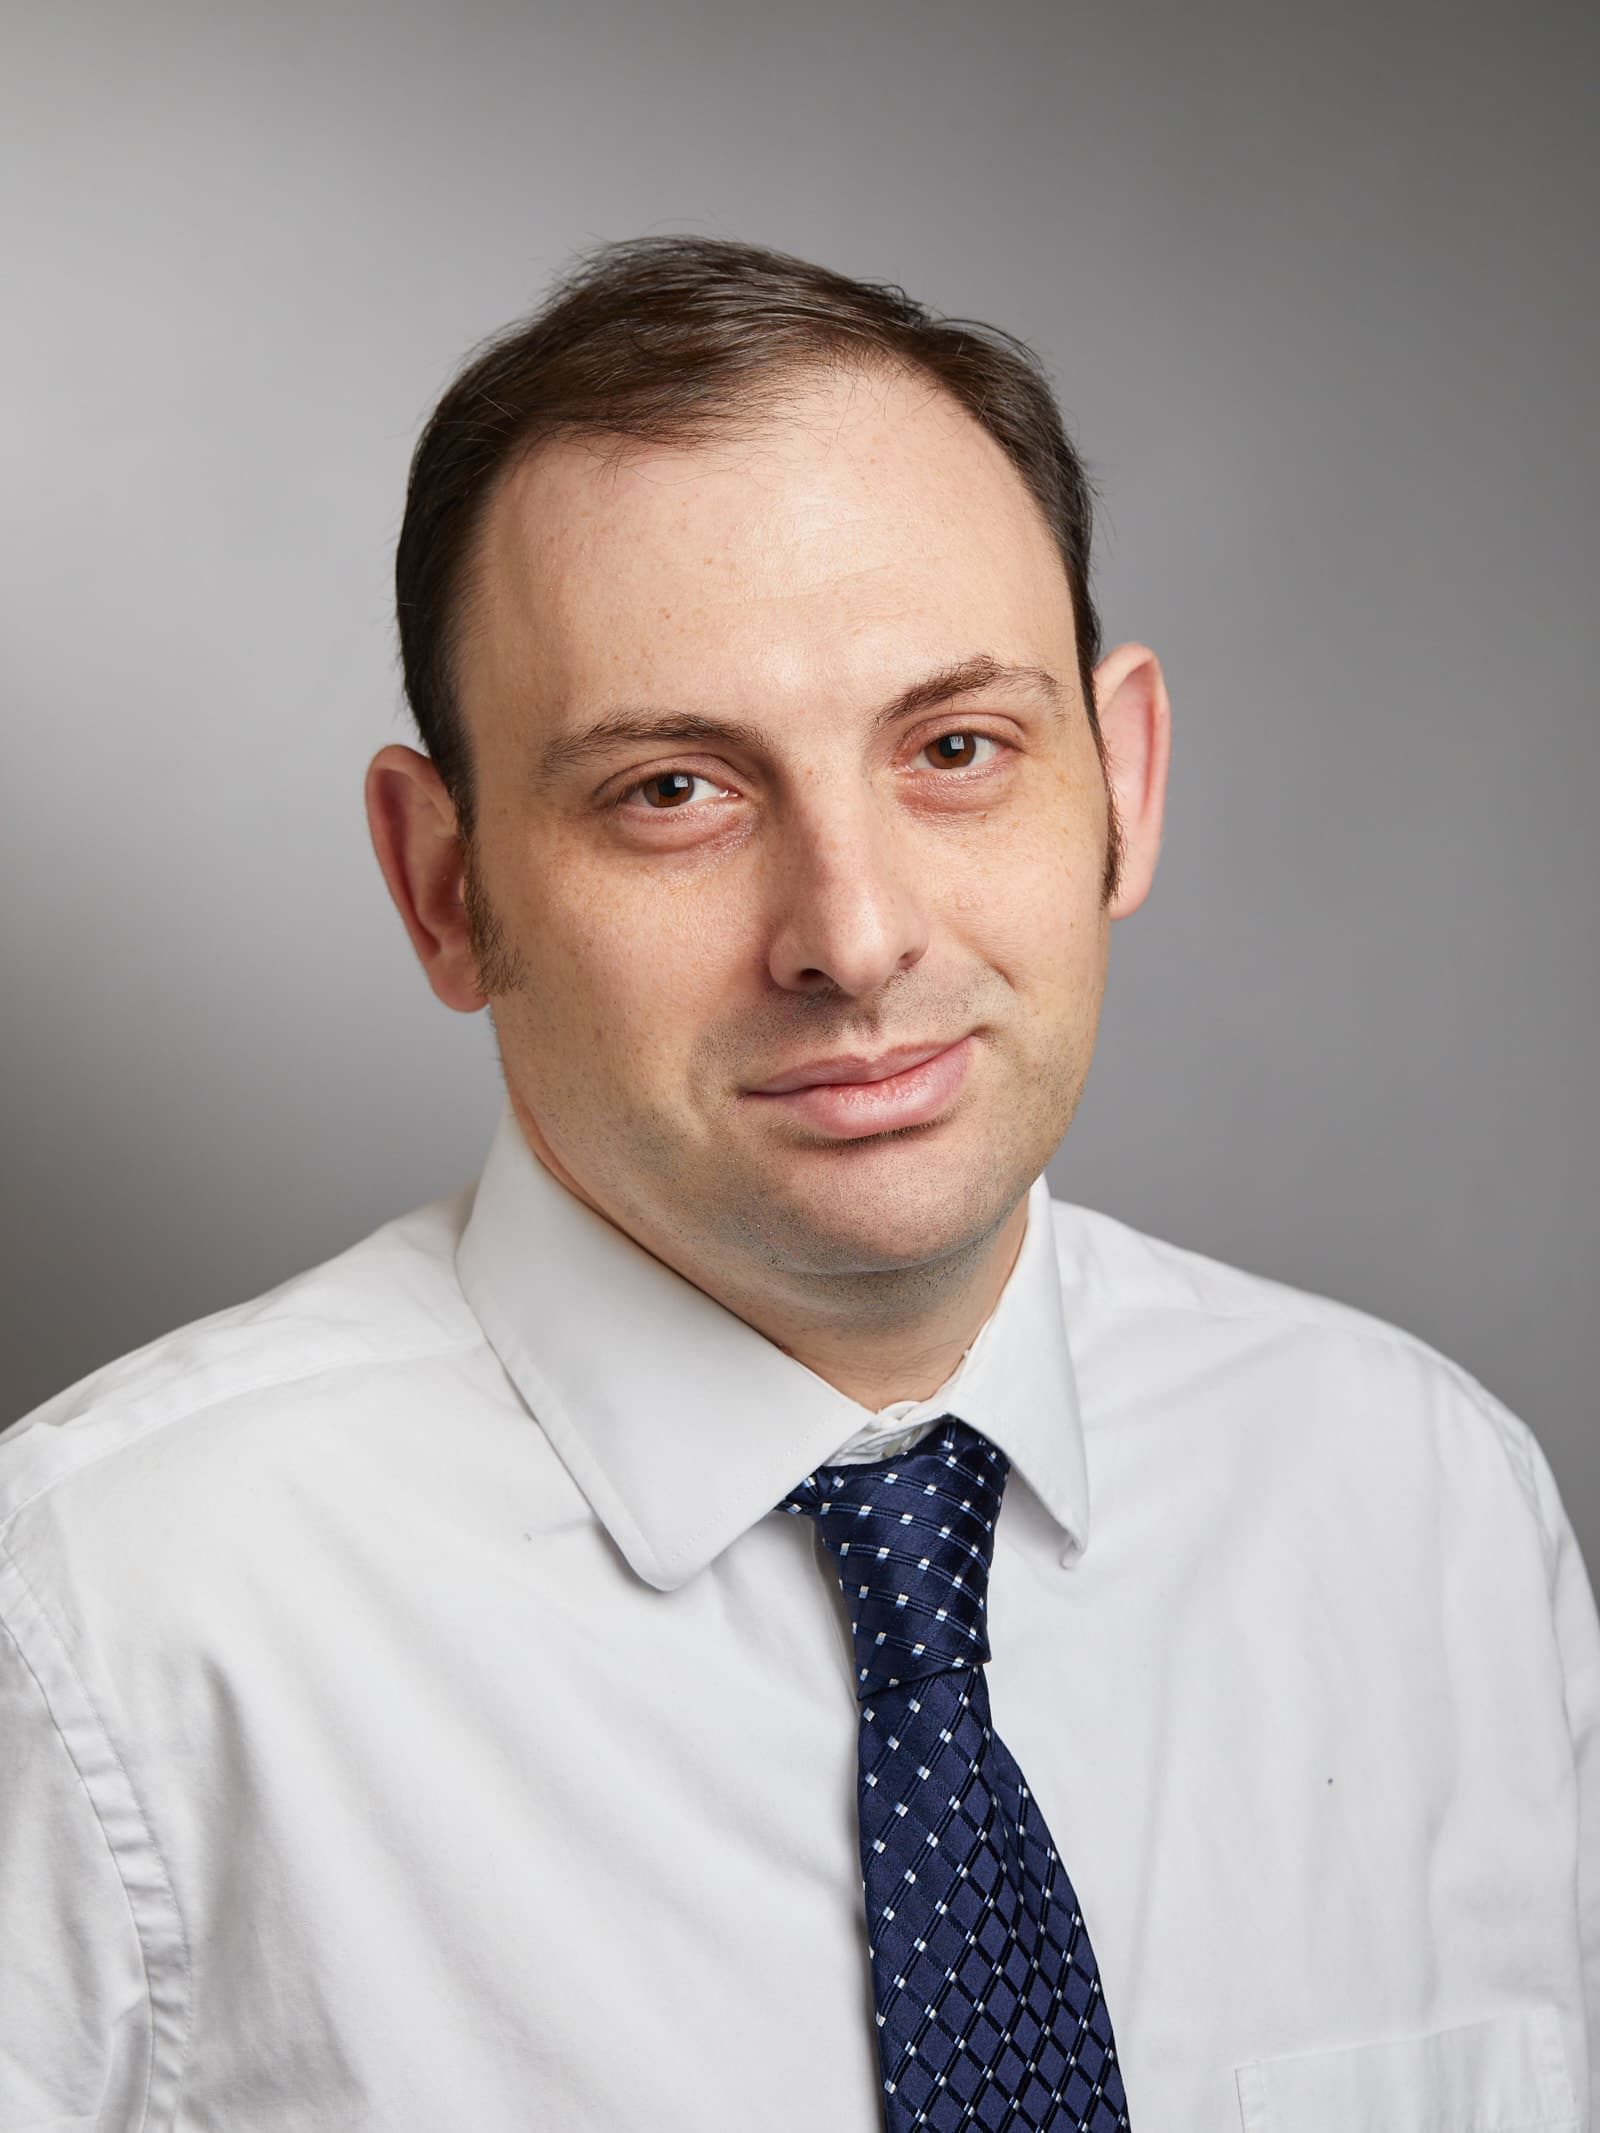 Michael Bloch